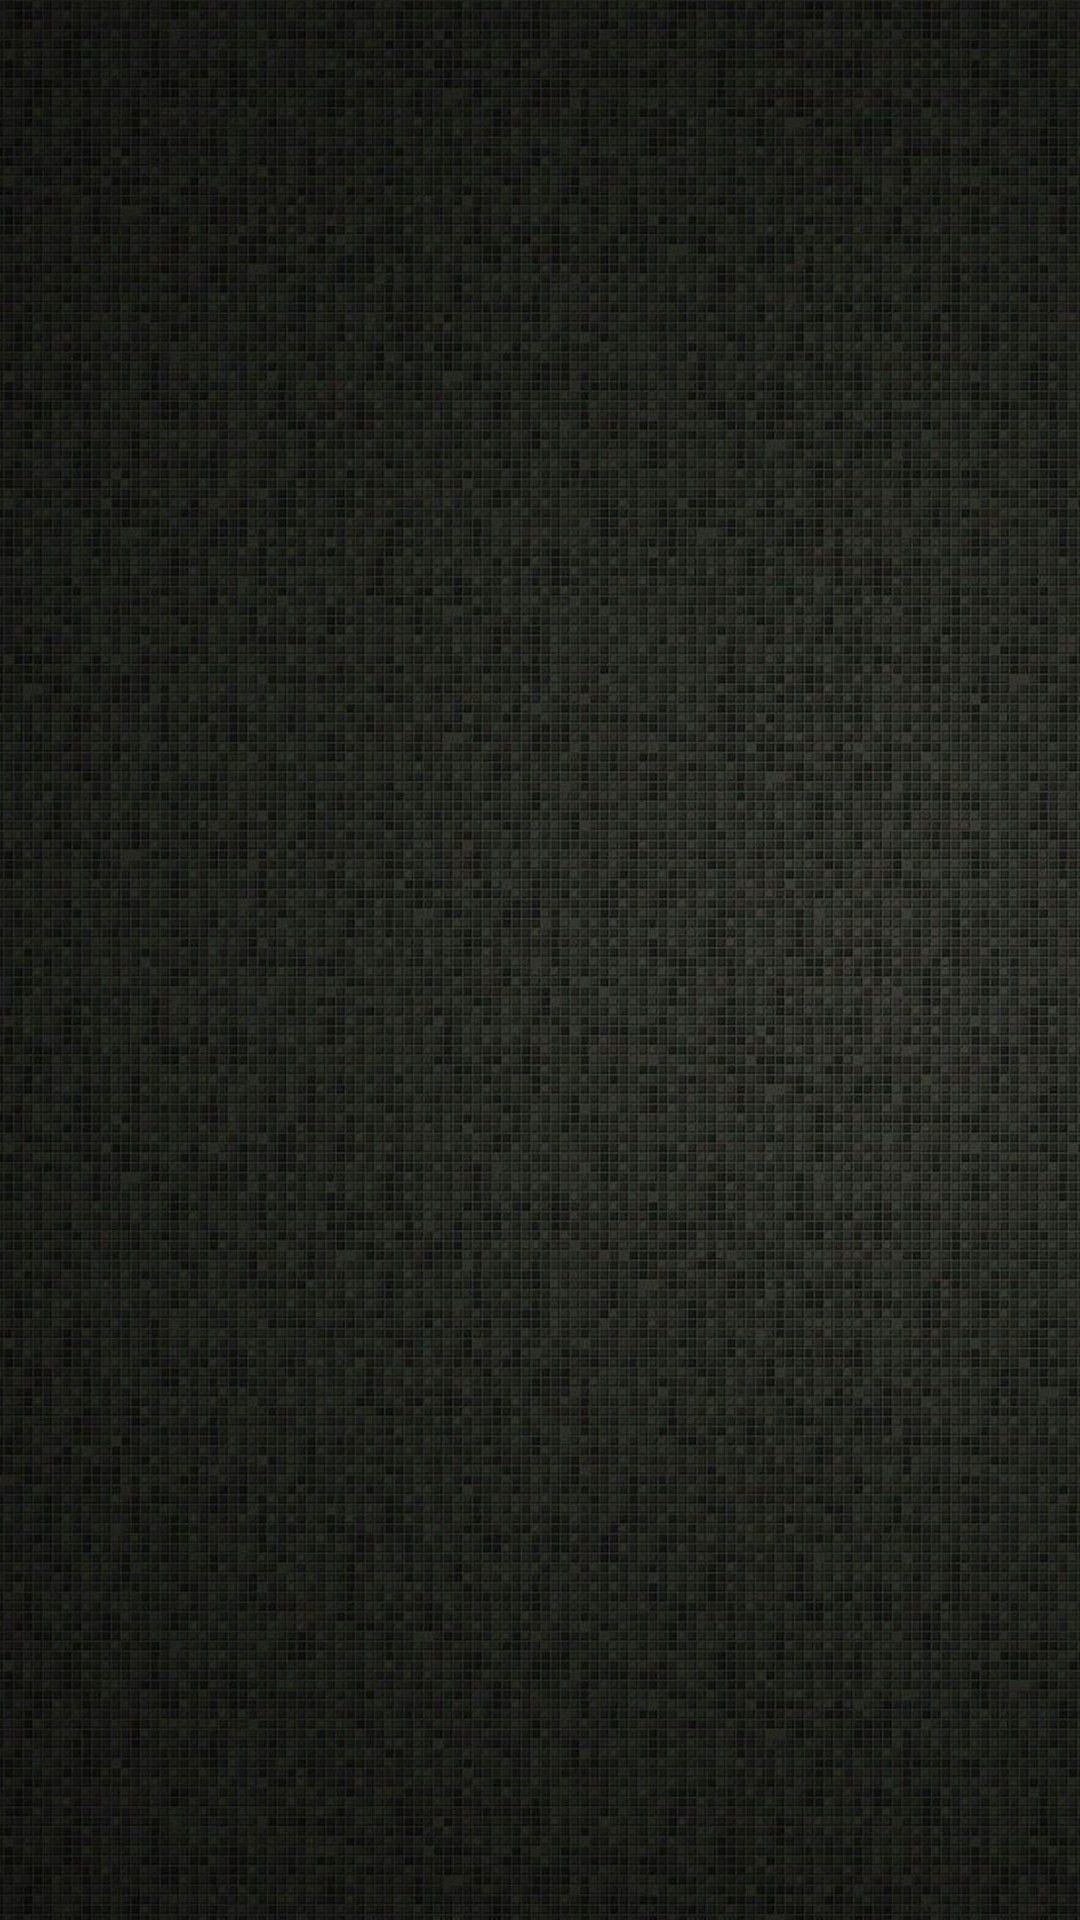 Dark Mobile Wallpapers Group (48+)